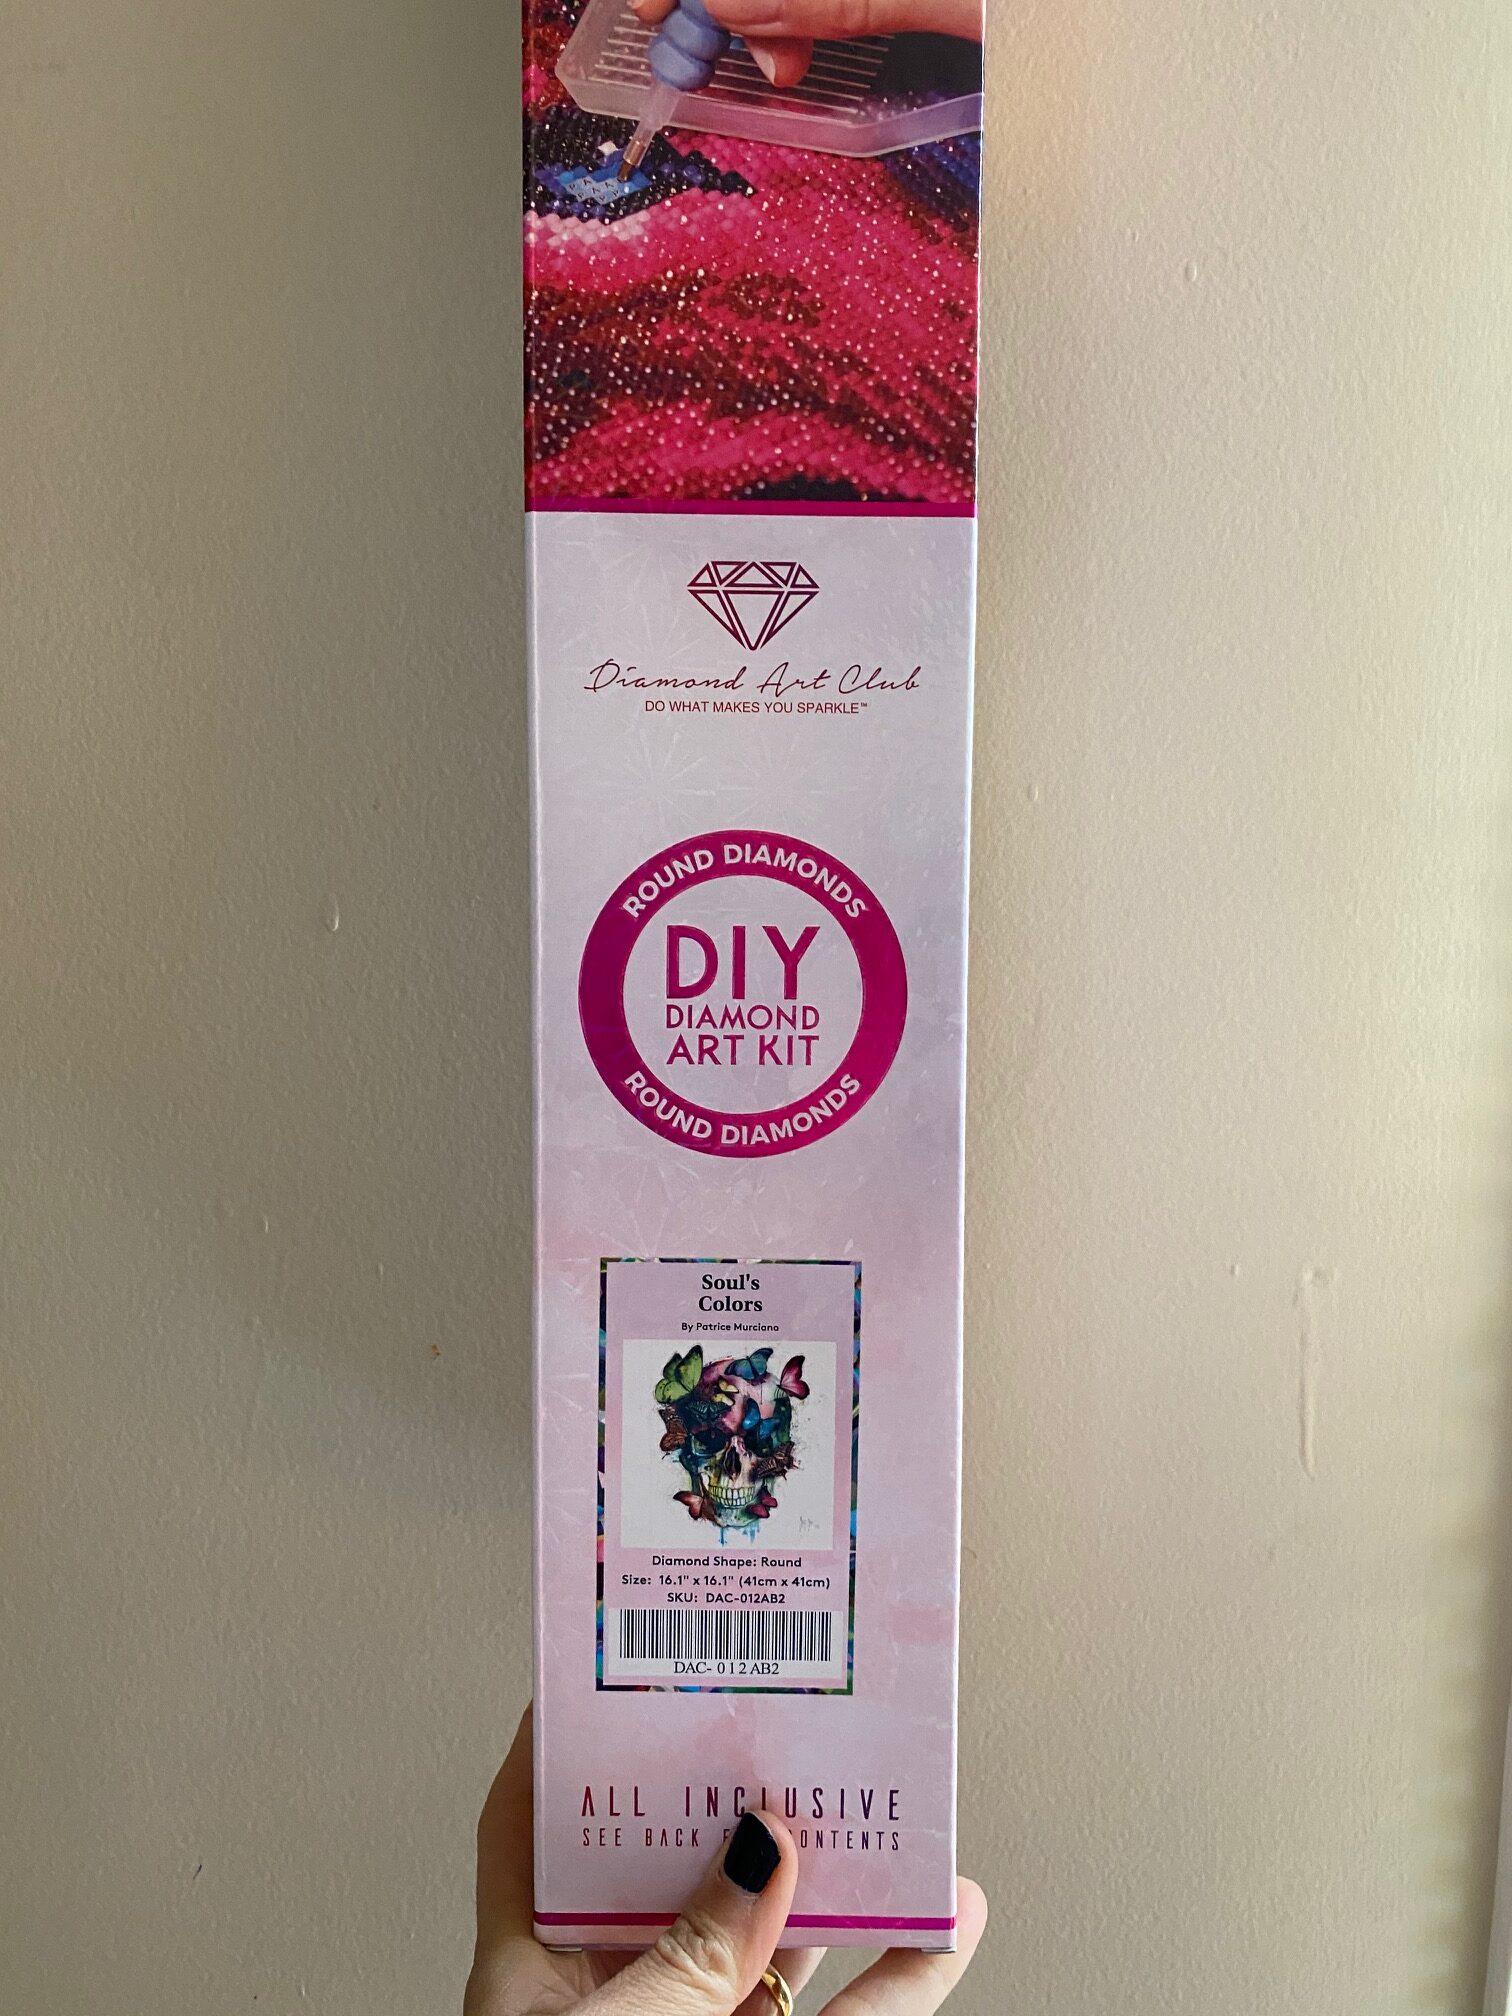 Diamond Art Kits for kids